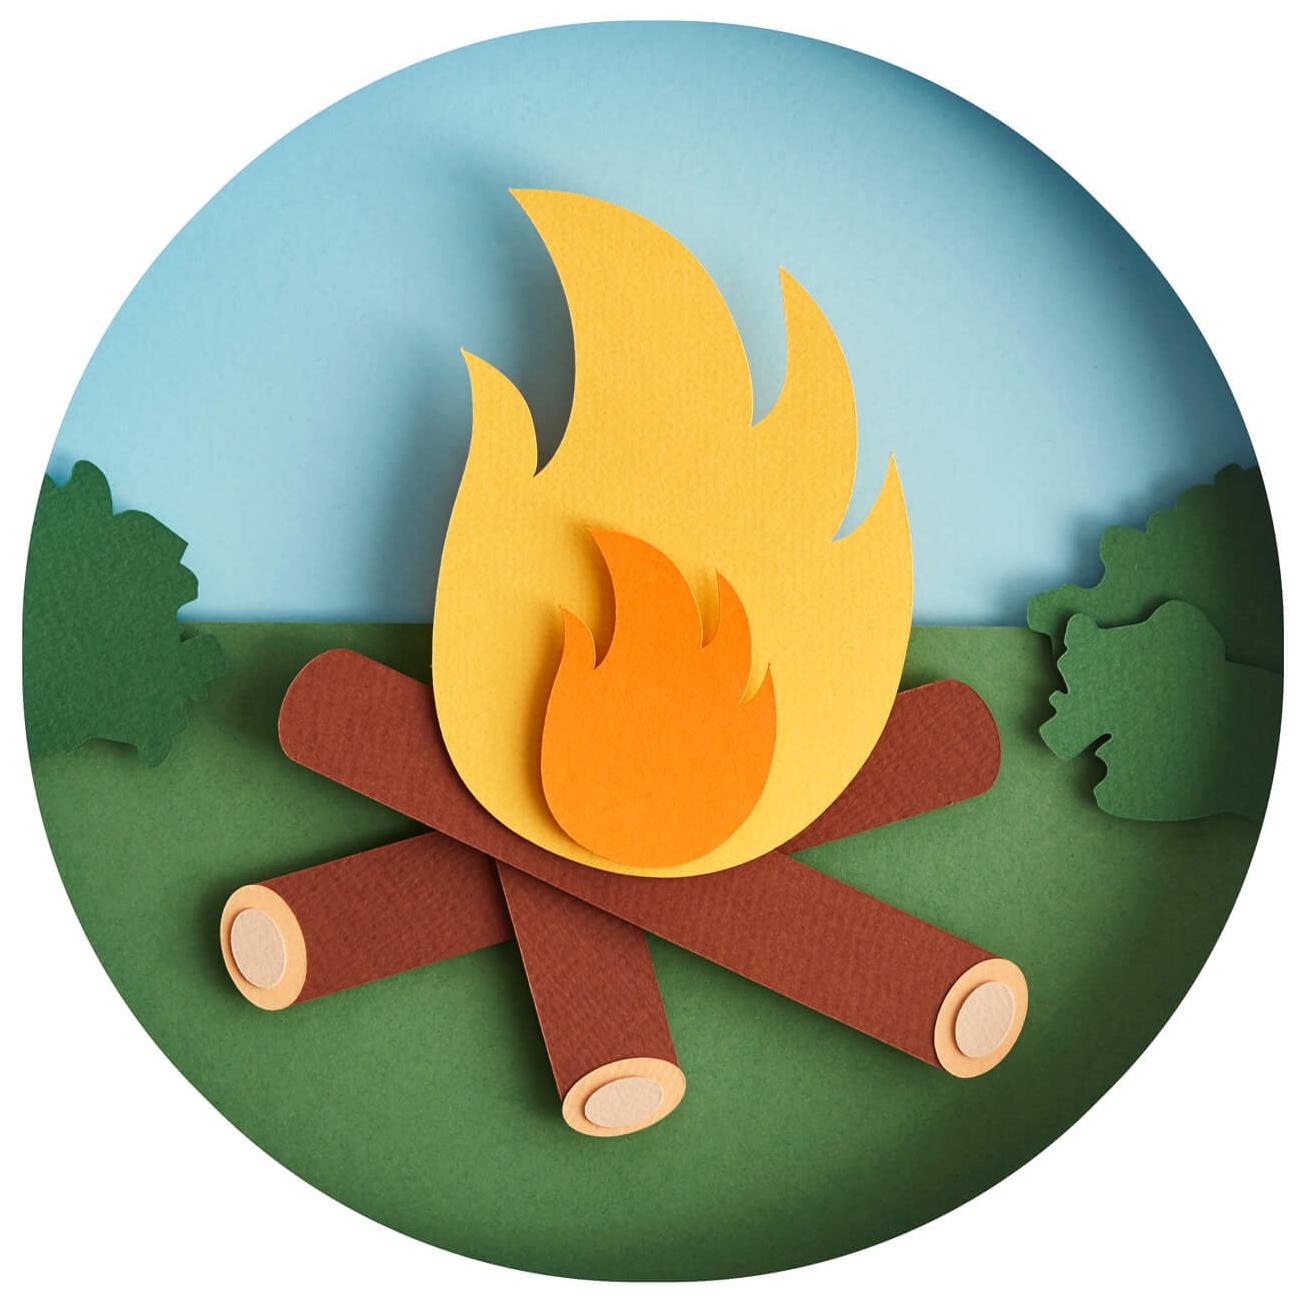 freemensworld_fire1_paperart_katrinrodegast_web